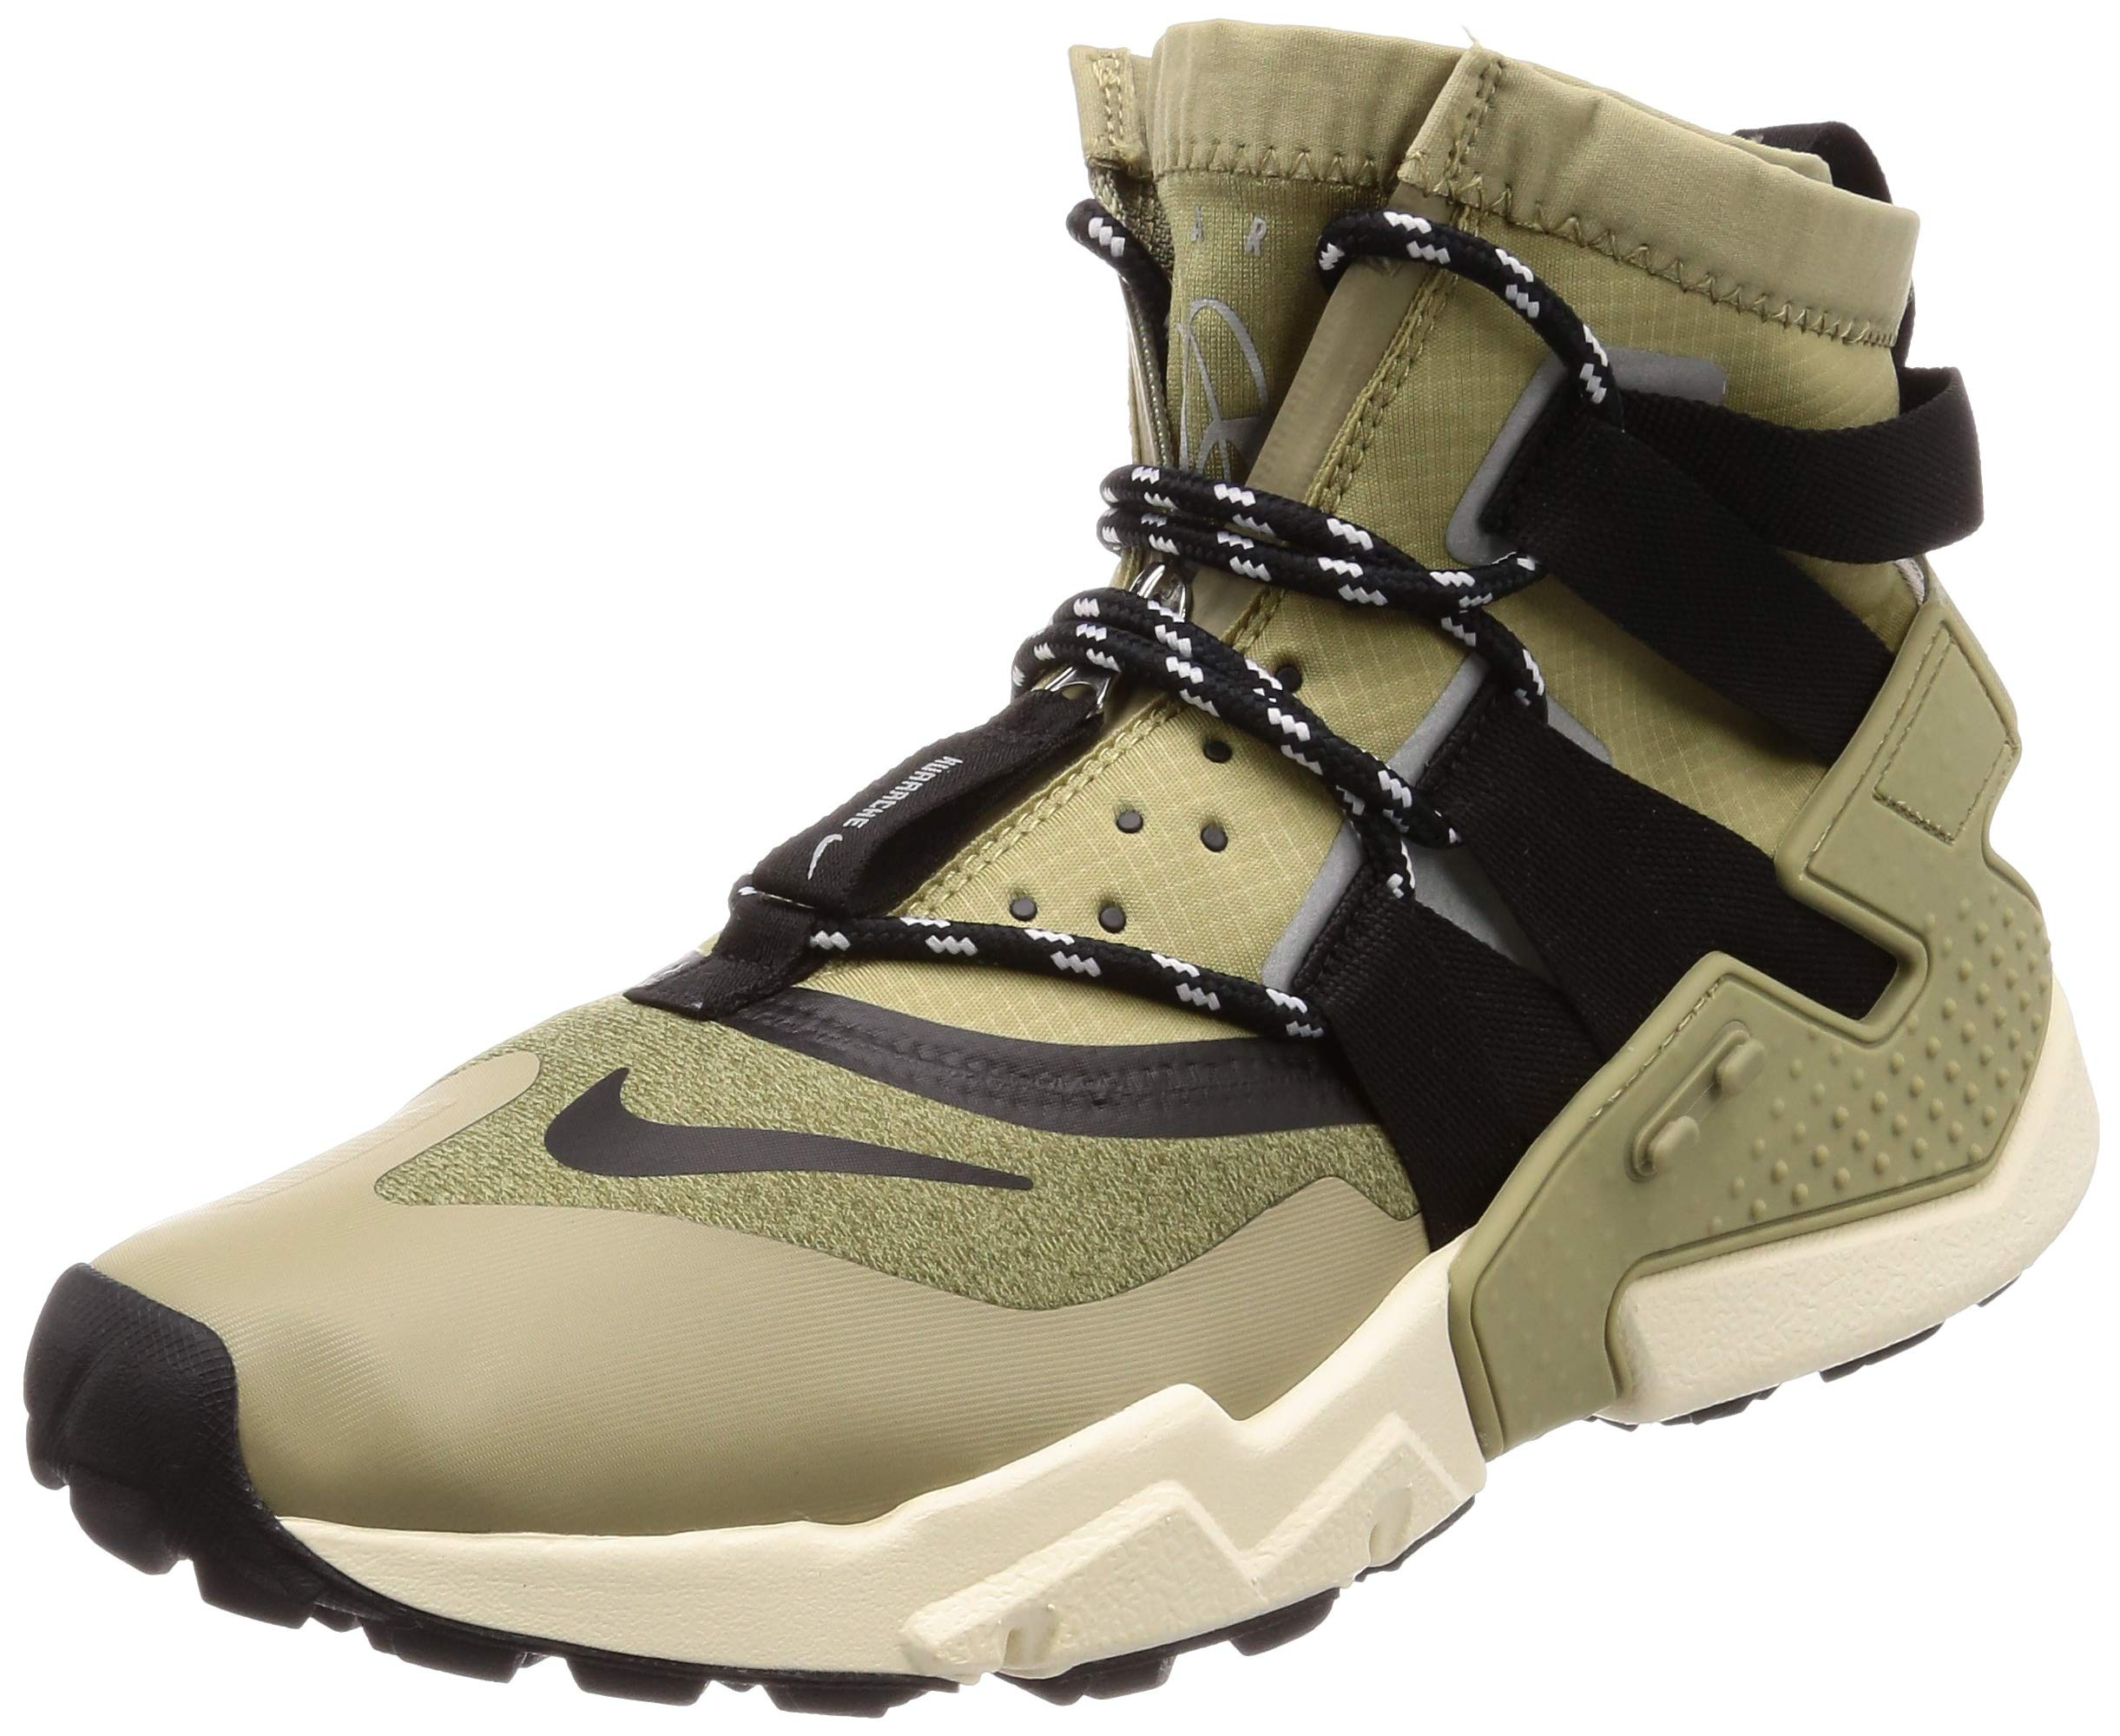 ff0f83bb0c Galleon - Nike Air Huarache Gripp Men's Shoes Neutral Olive/Black  Ao1730-200 (11 D(M) US)